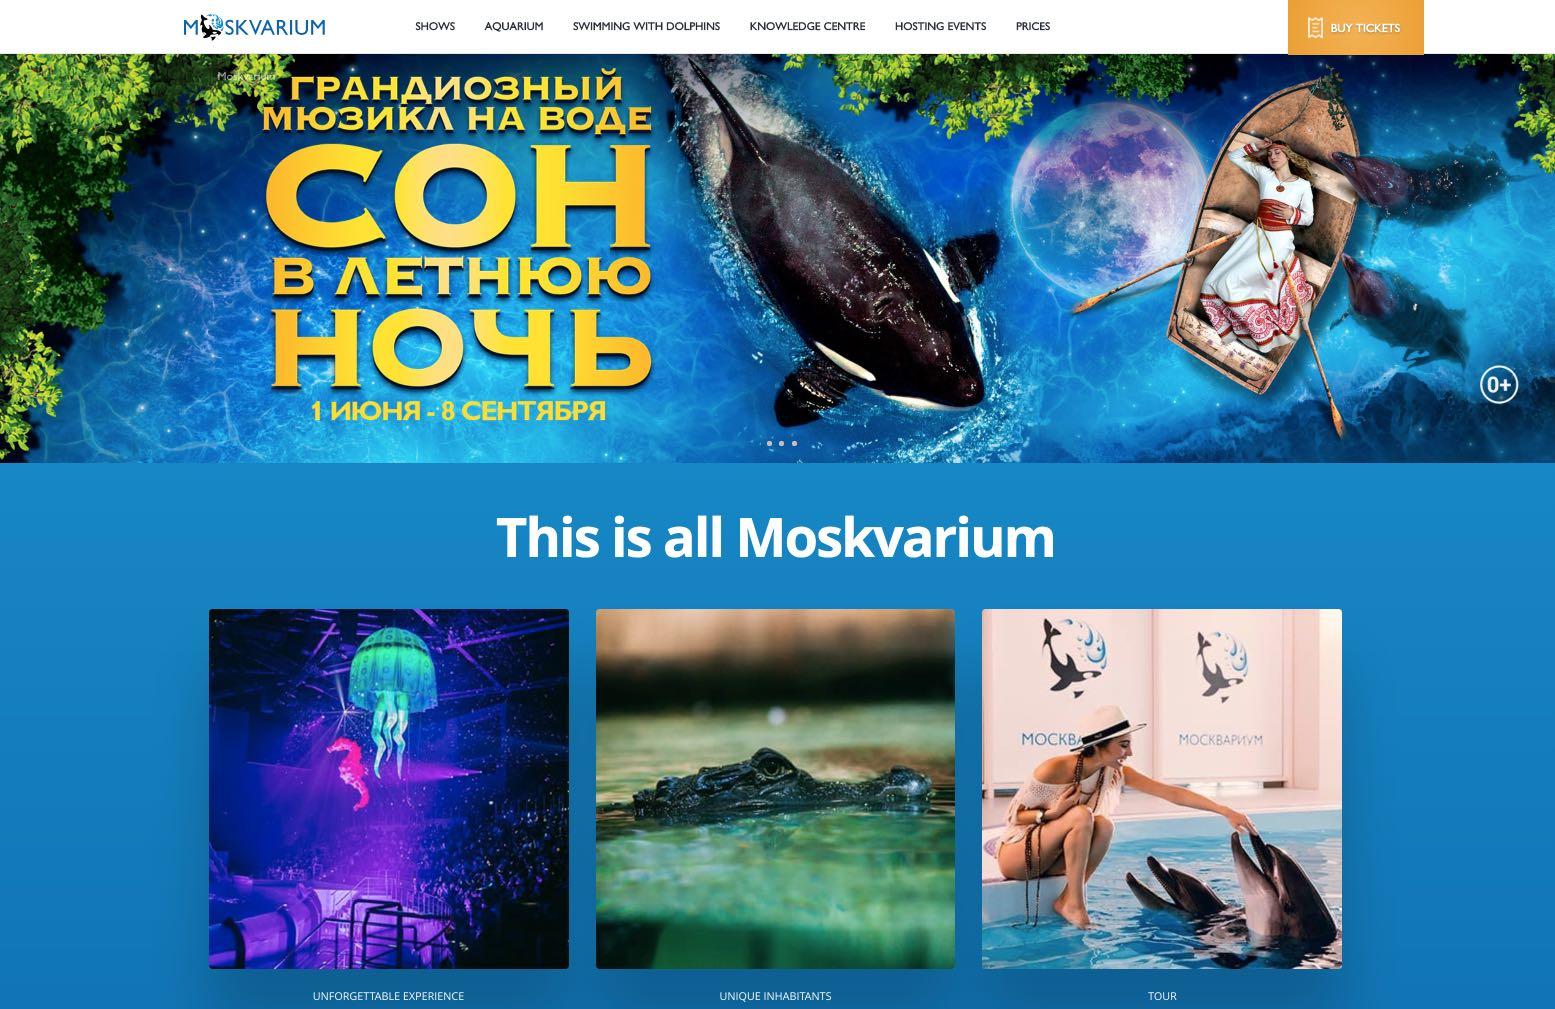 Moskvarium - VDNH Moscow